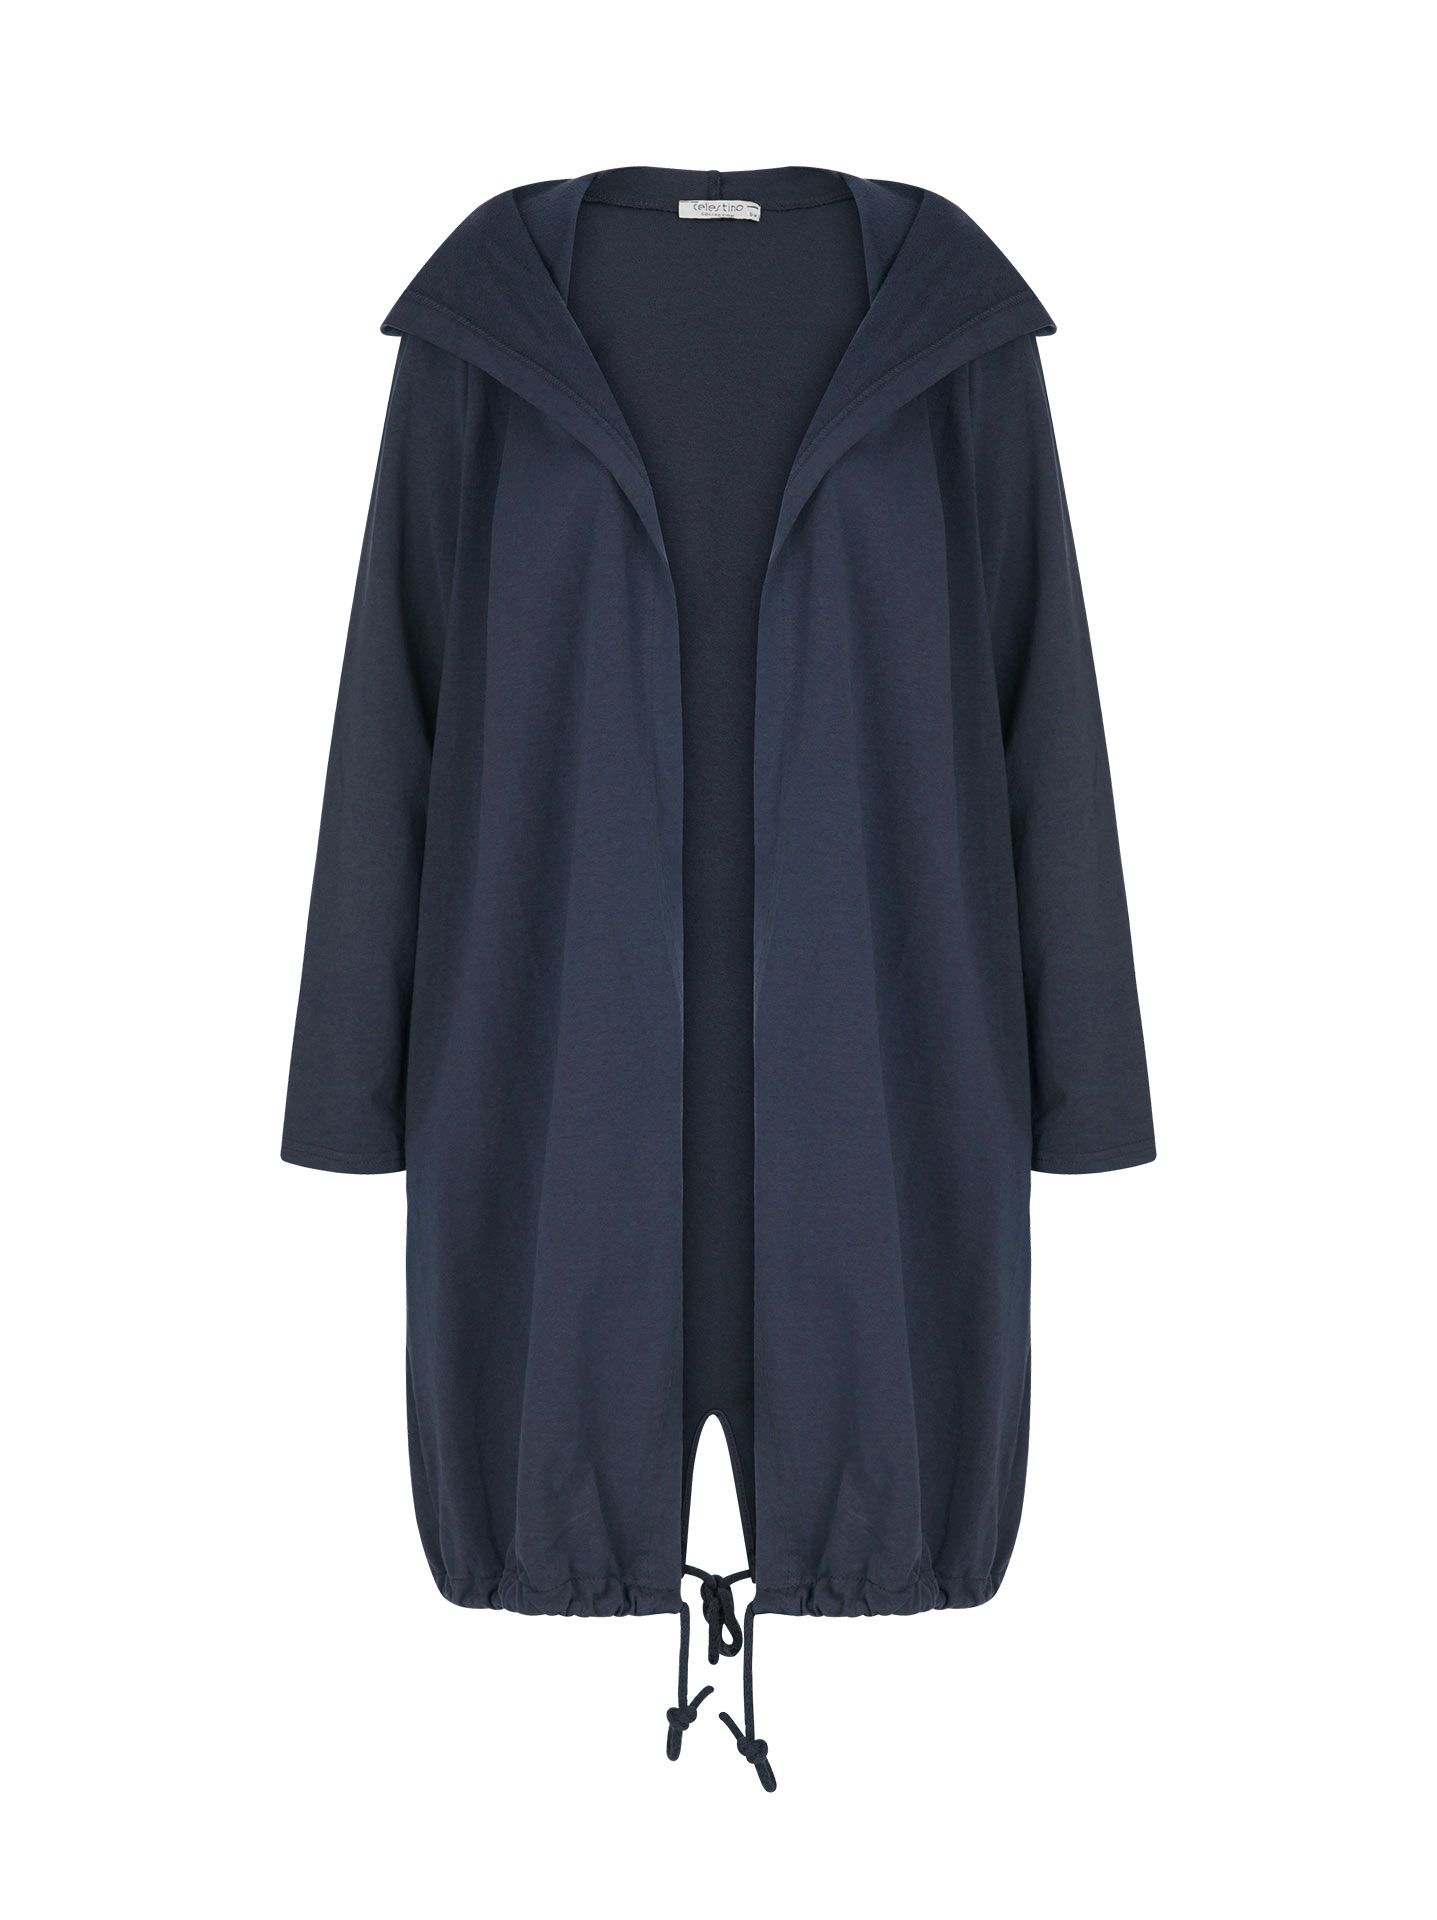 ce1036b2f2 Plus size hooded sweatshirt cardigan in dark blue